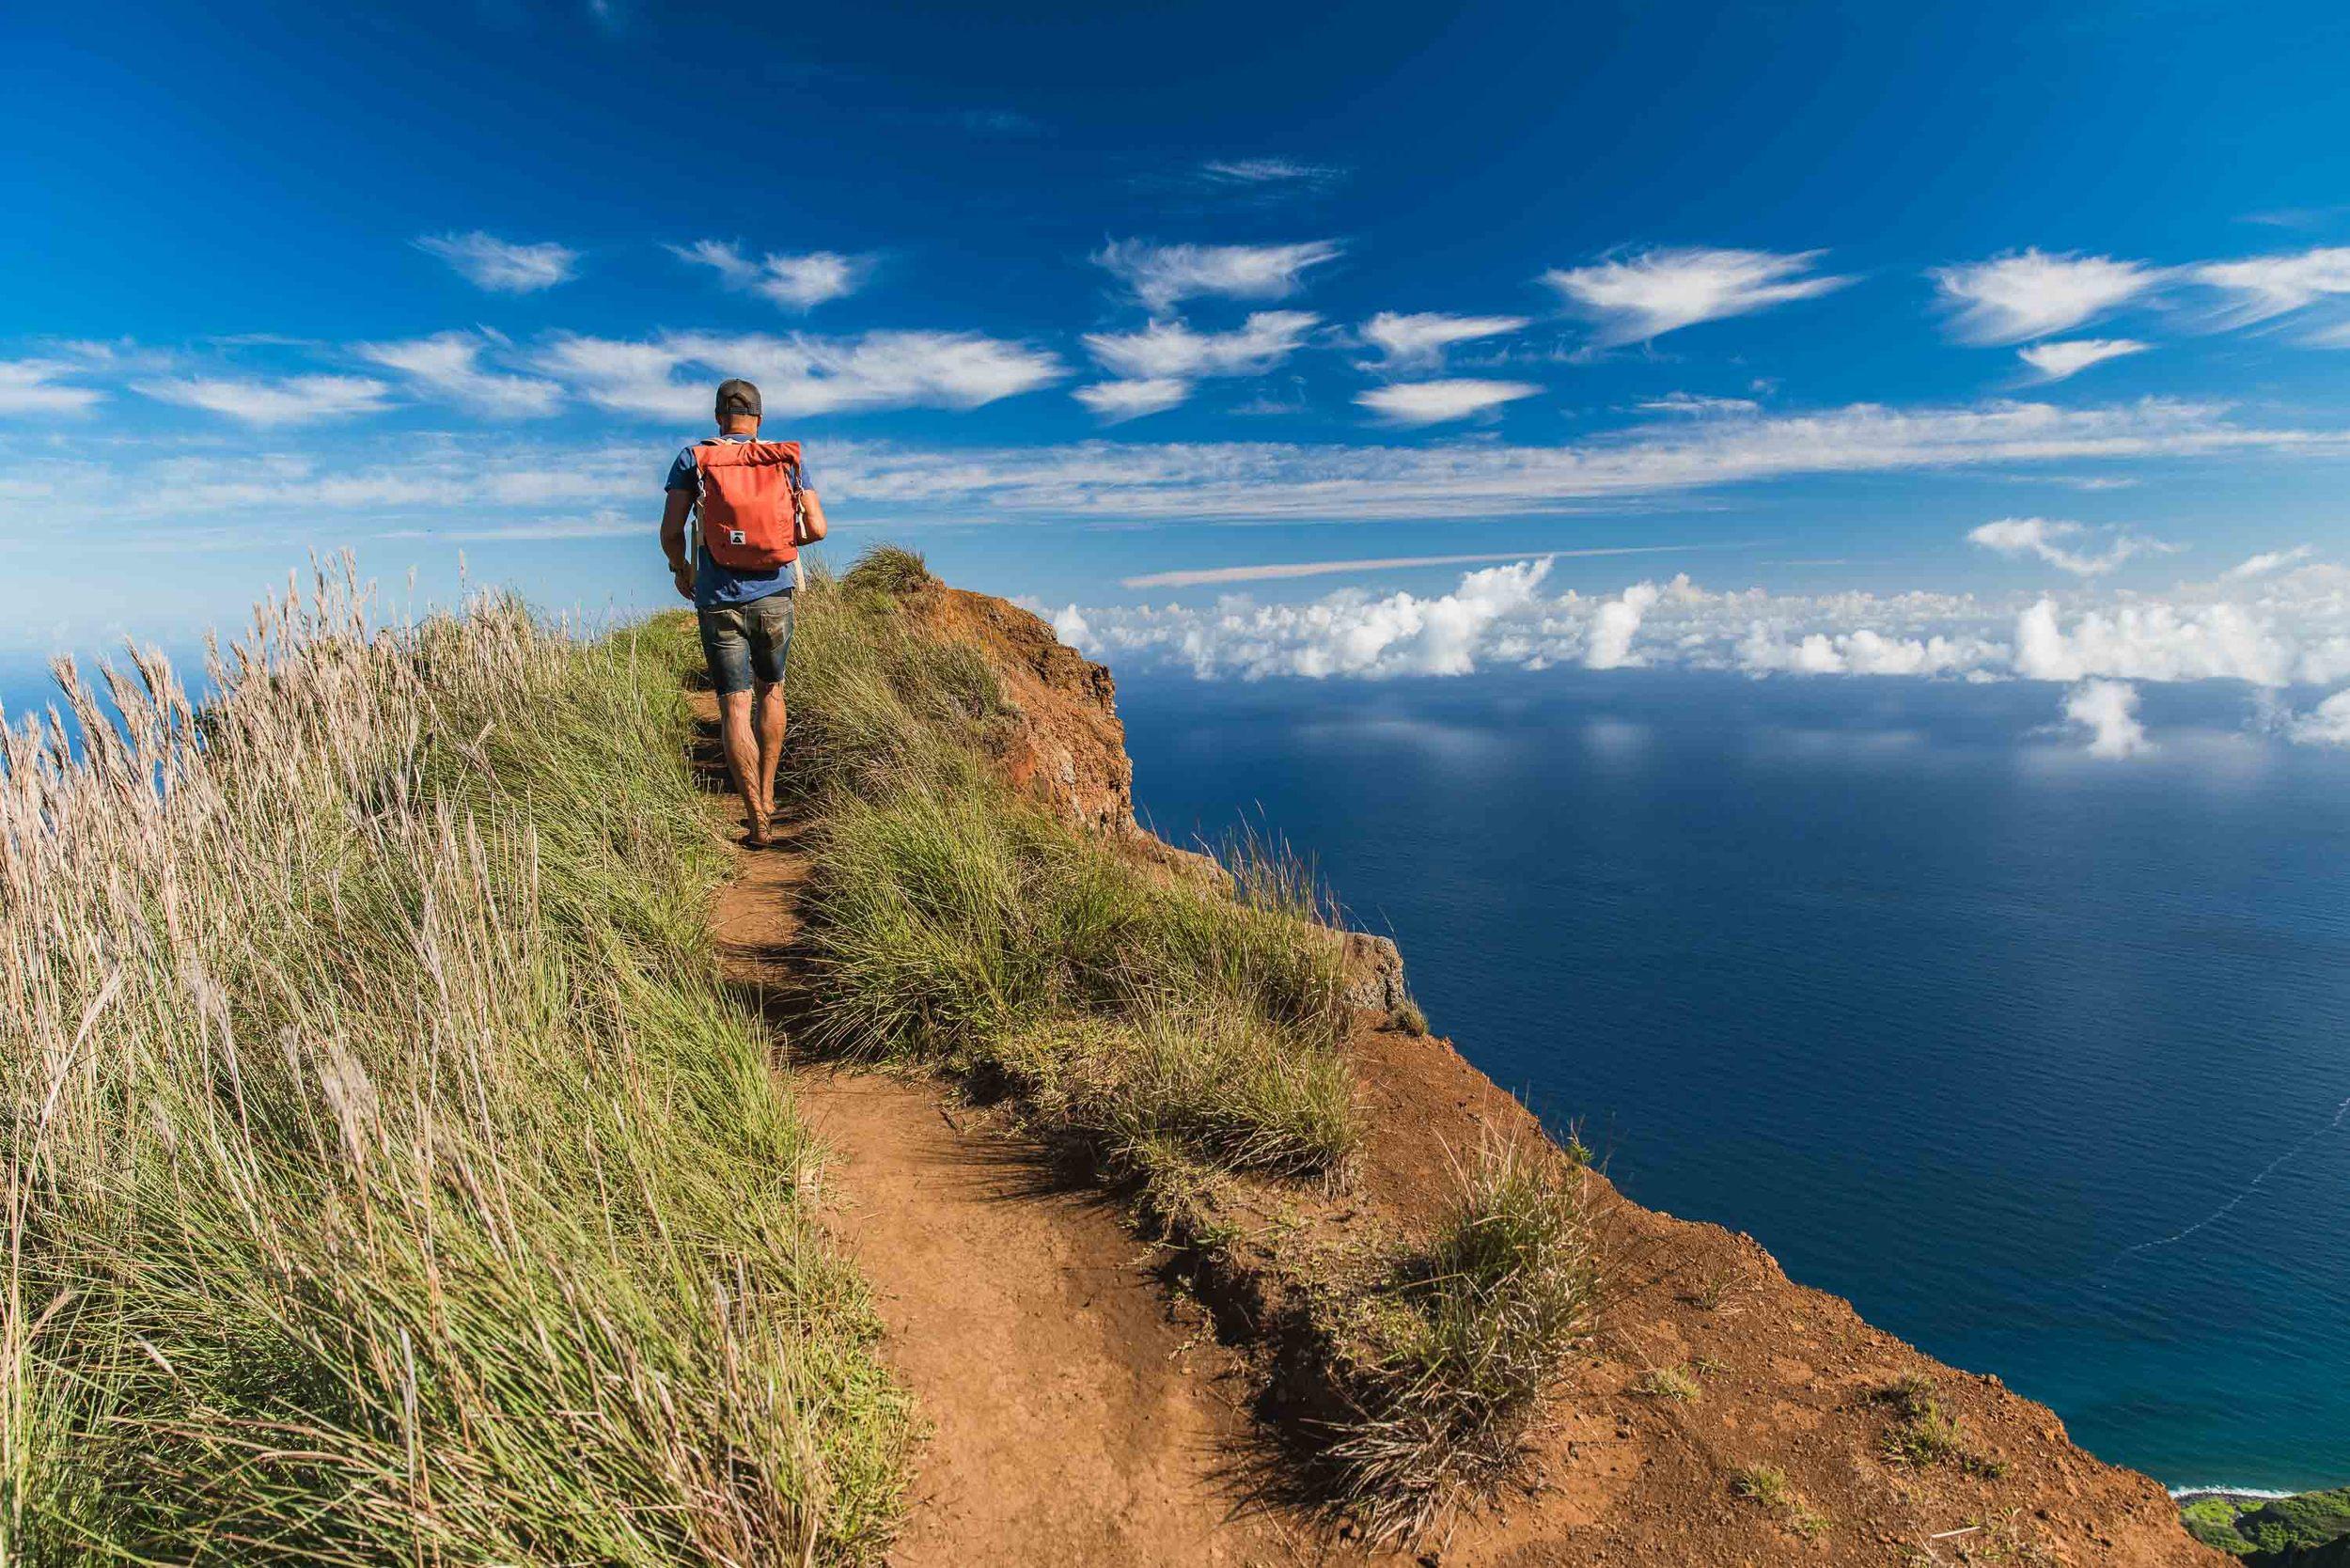 bryce-johnson-kalalau-ridge-kauai-hiking-hammock-palmwood-aloha-exchange-6.jpg